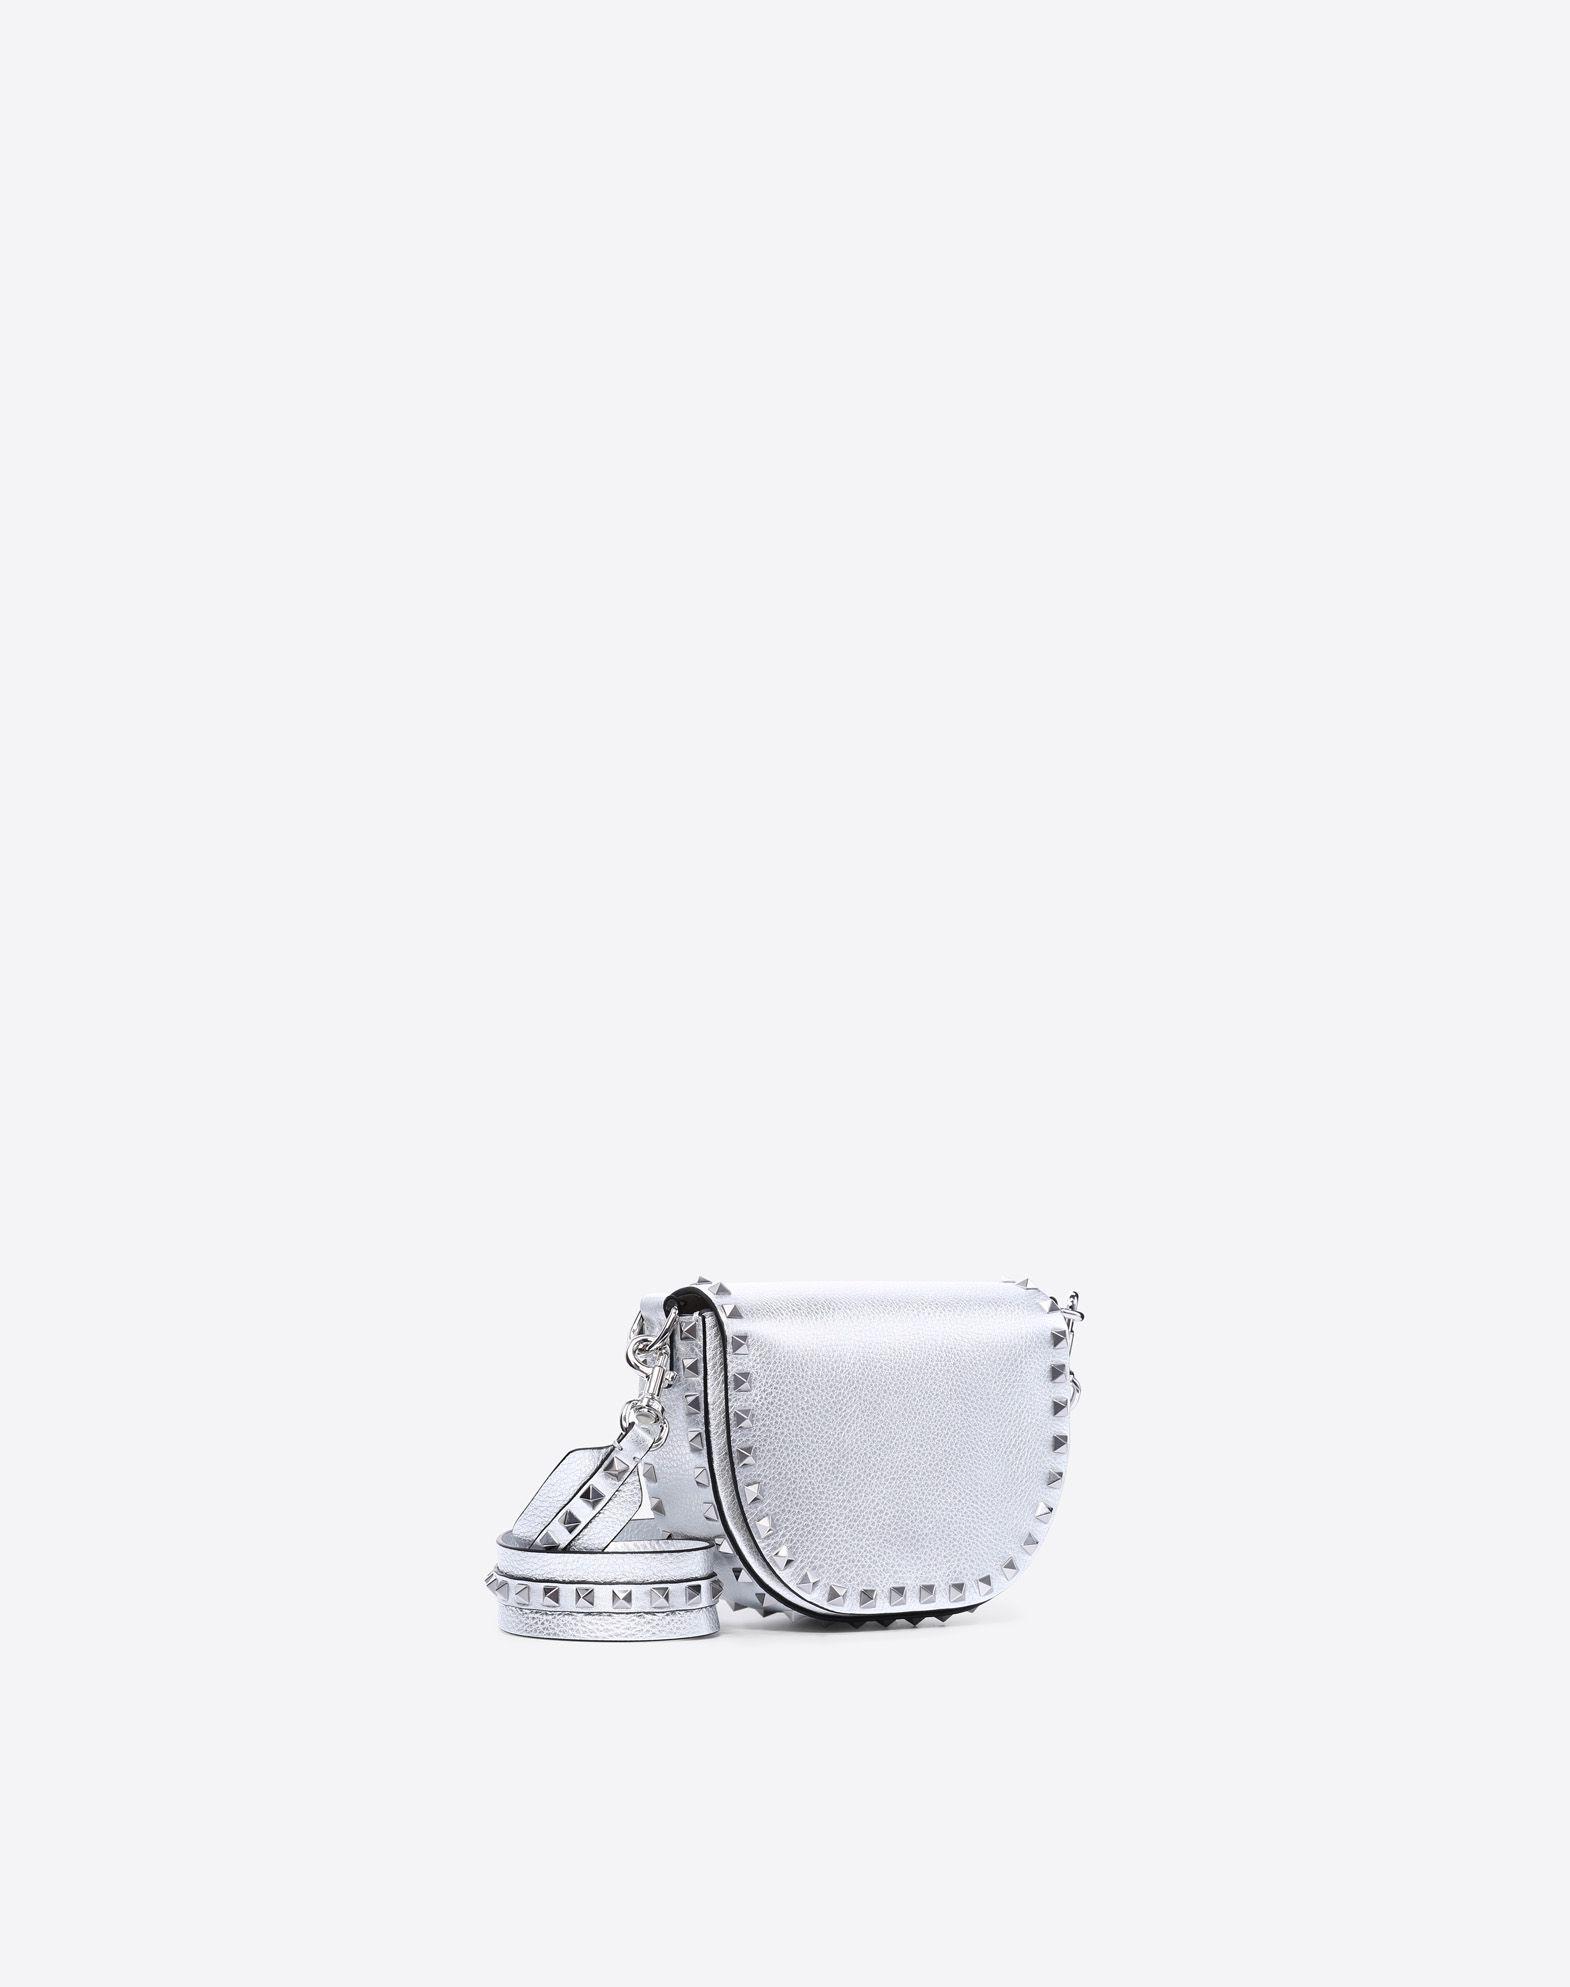 VALENTINO GARAVANI Rockstud Mini Shoulder Bag CROSS BODY BAG D r